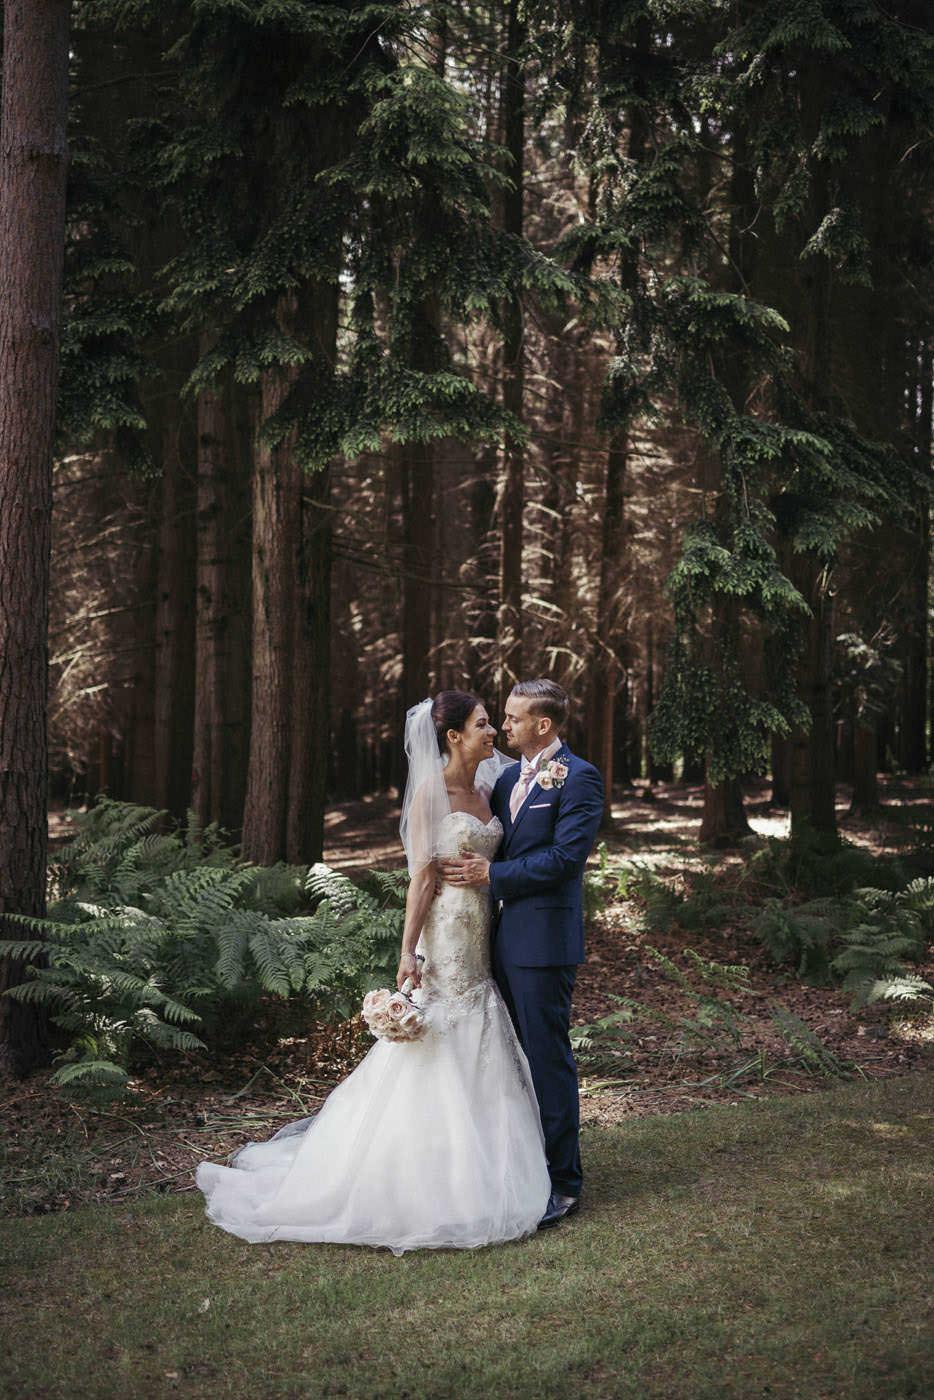 lukeemily foxhills wedding photographer 0072